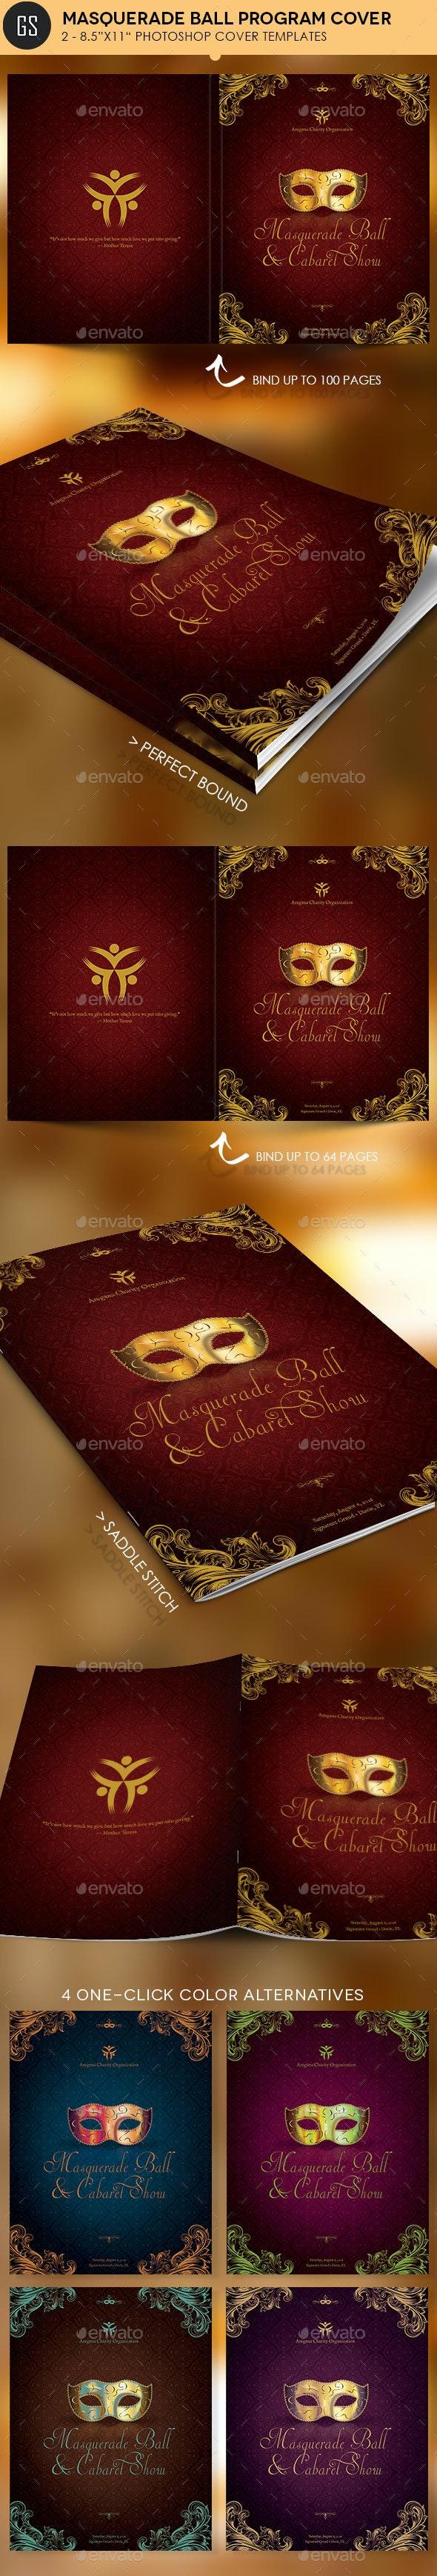 Masquerade Ball Program Cover Template - Magazines Print Templates